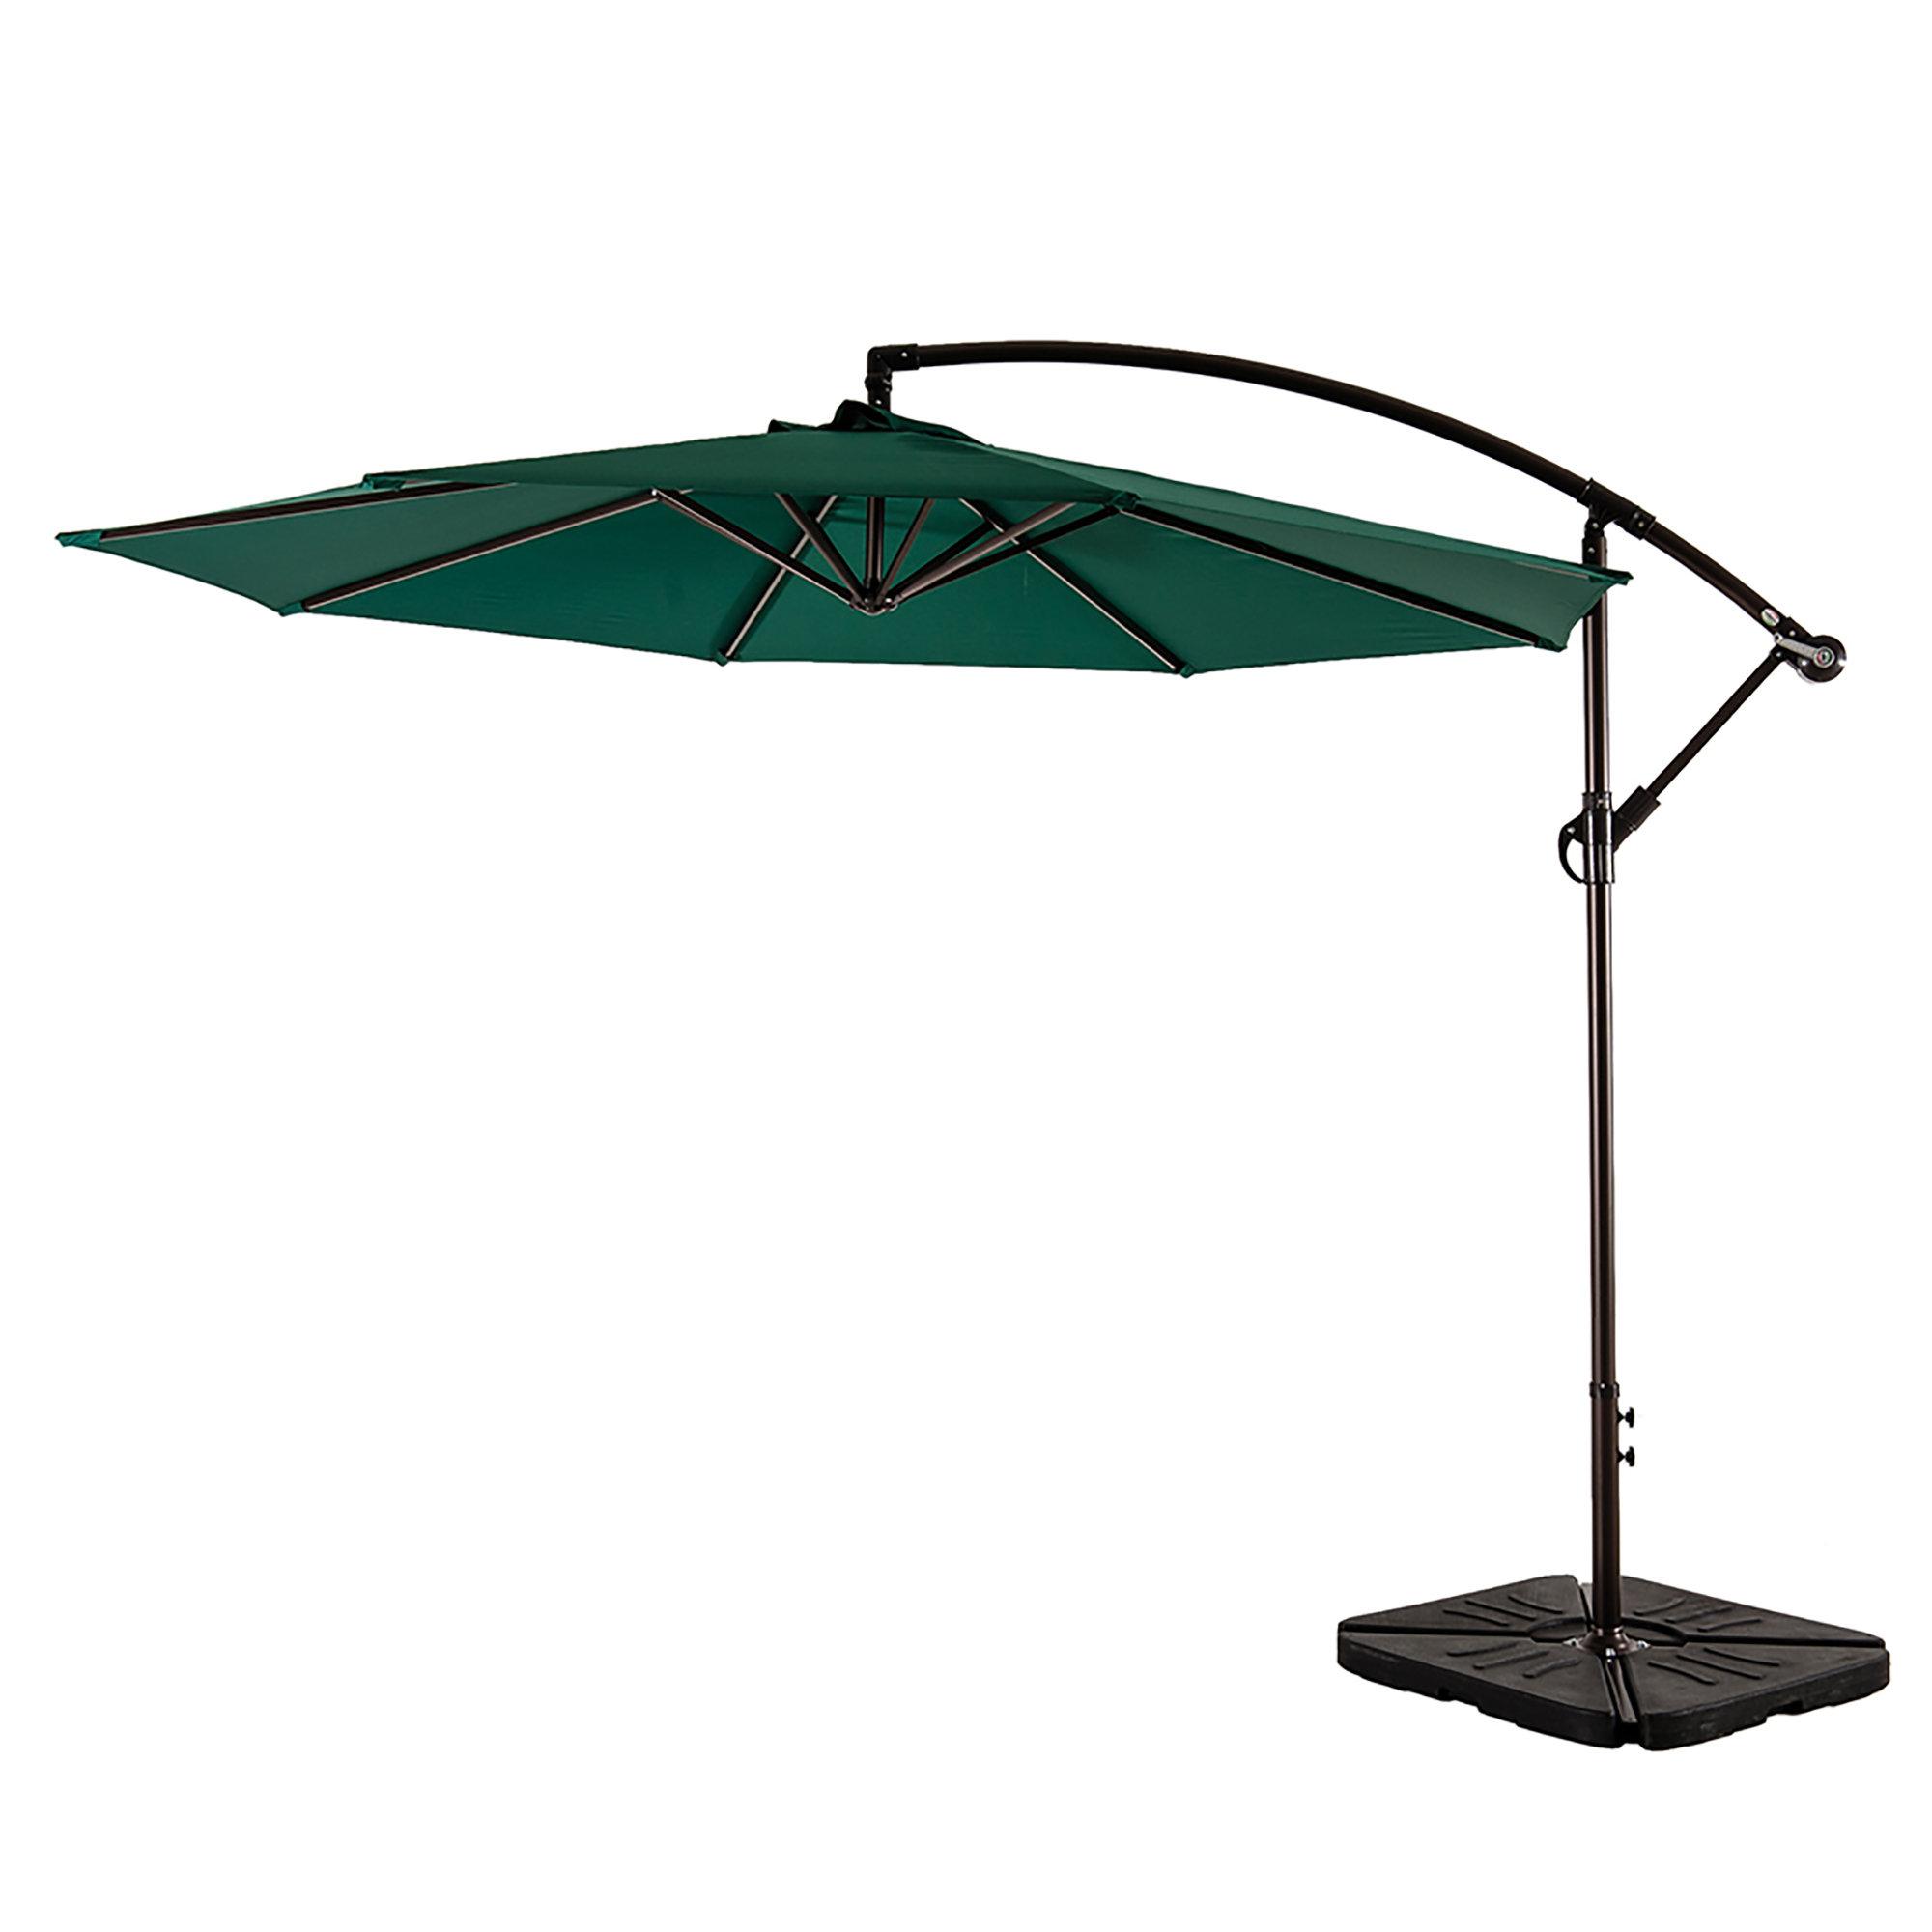 Karr 10' Cantilever Umbrella With 2020 Lora Market Umbrellas (View 5 of 20)